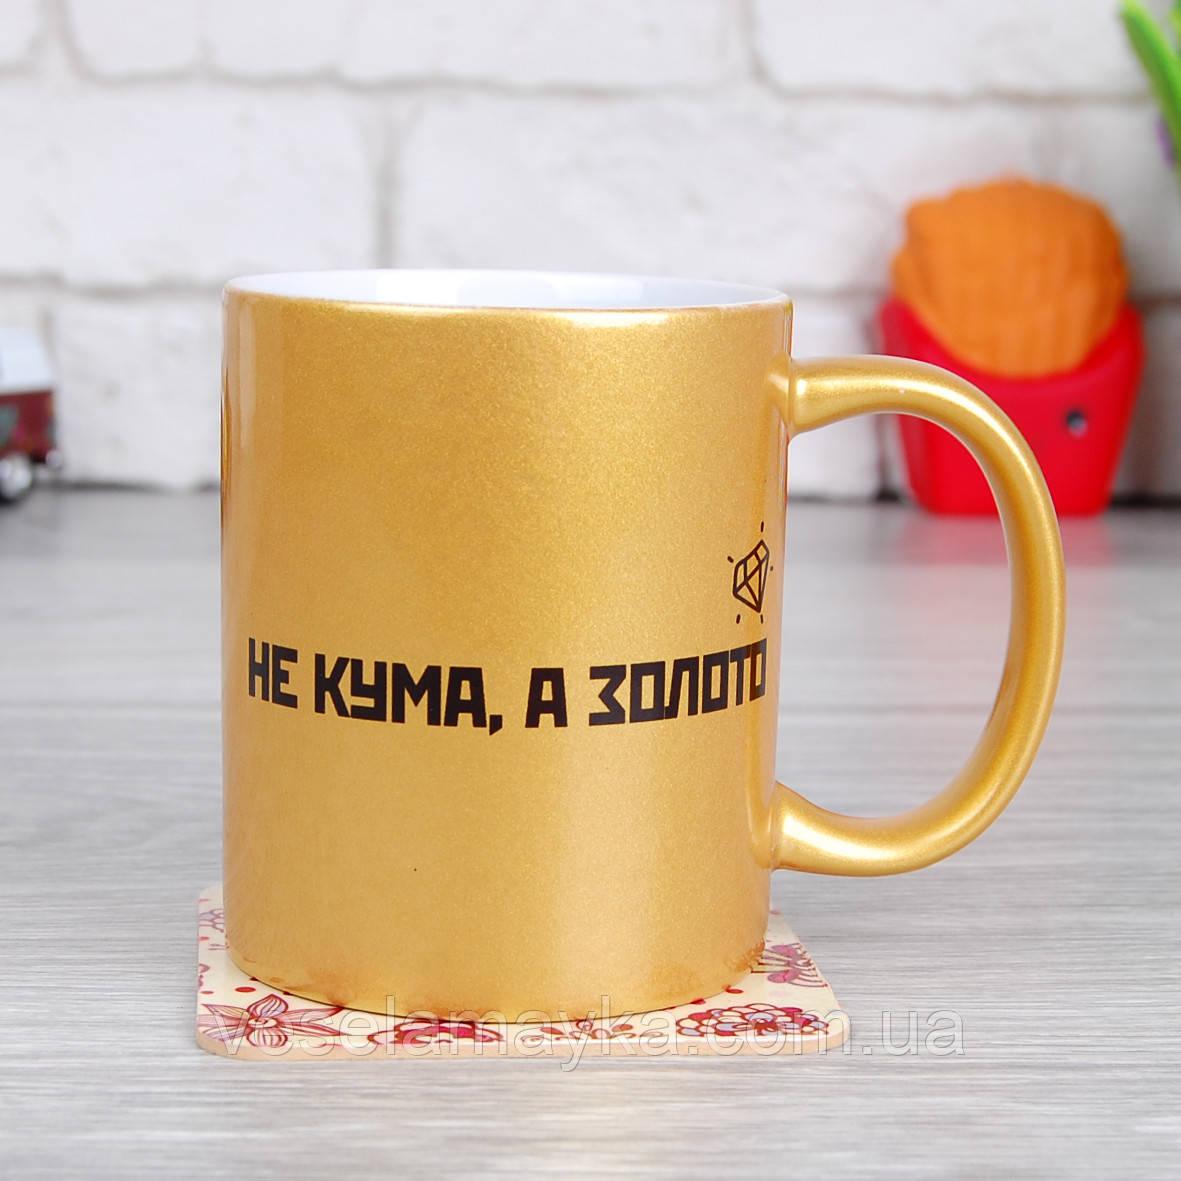 "Золотая чашка ""Не КУМА, а золото"""